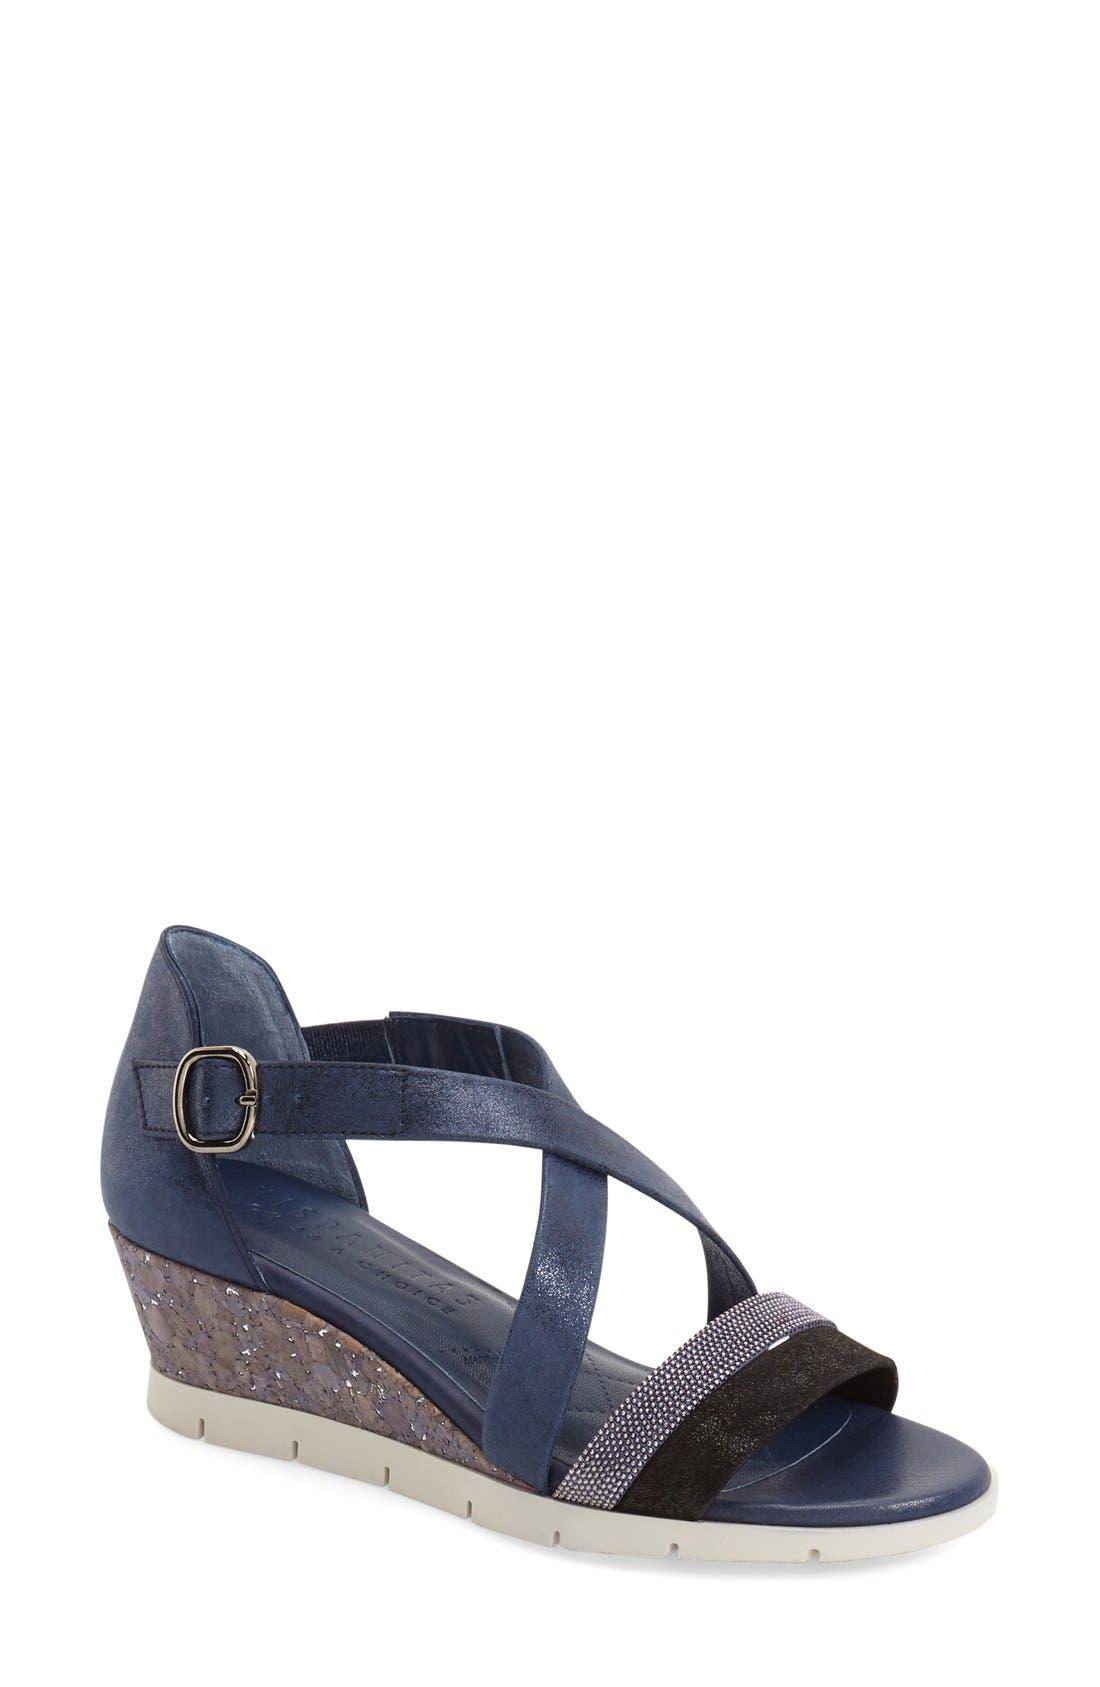 'Kennedi' Wedge Sandal,                             Main thumbnail 2, color,